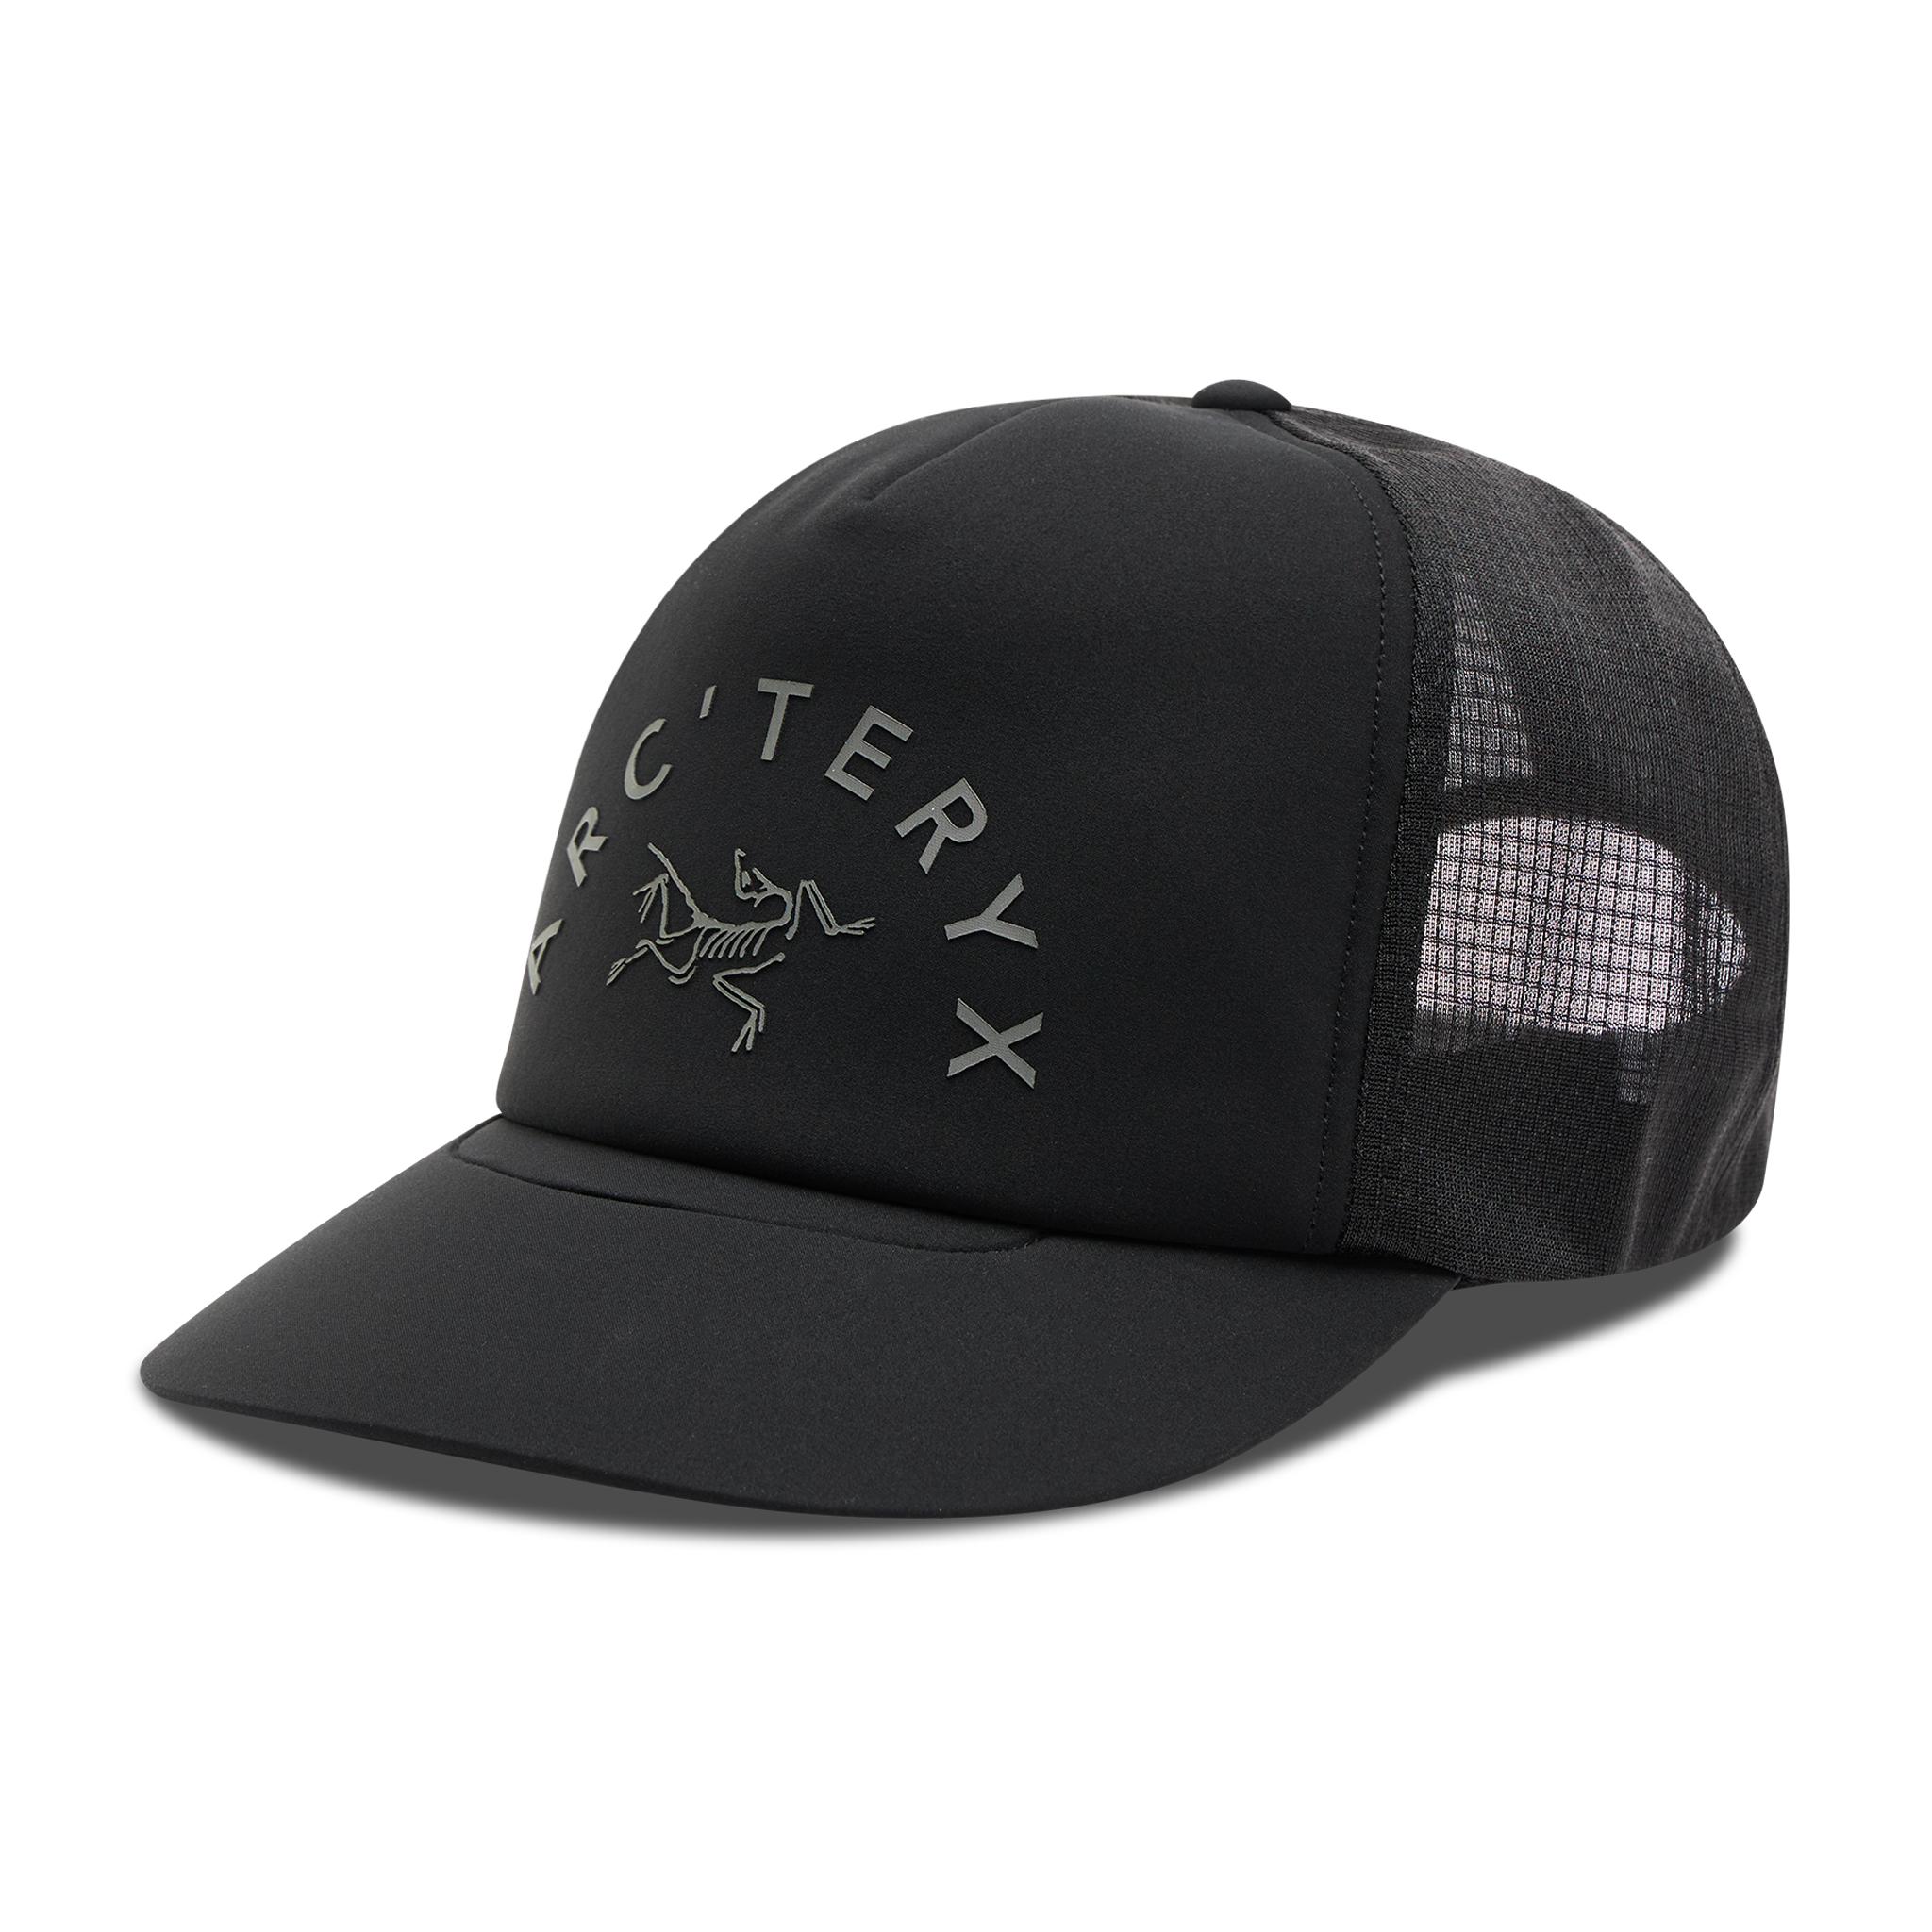 Image of Cap ARC'TERYX - Trucker Curved 27695 Black